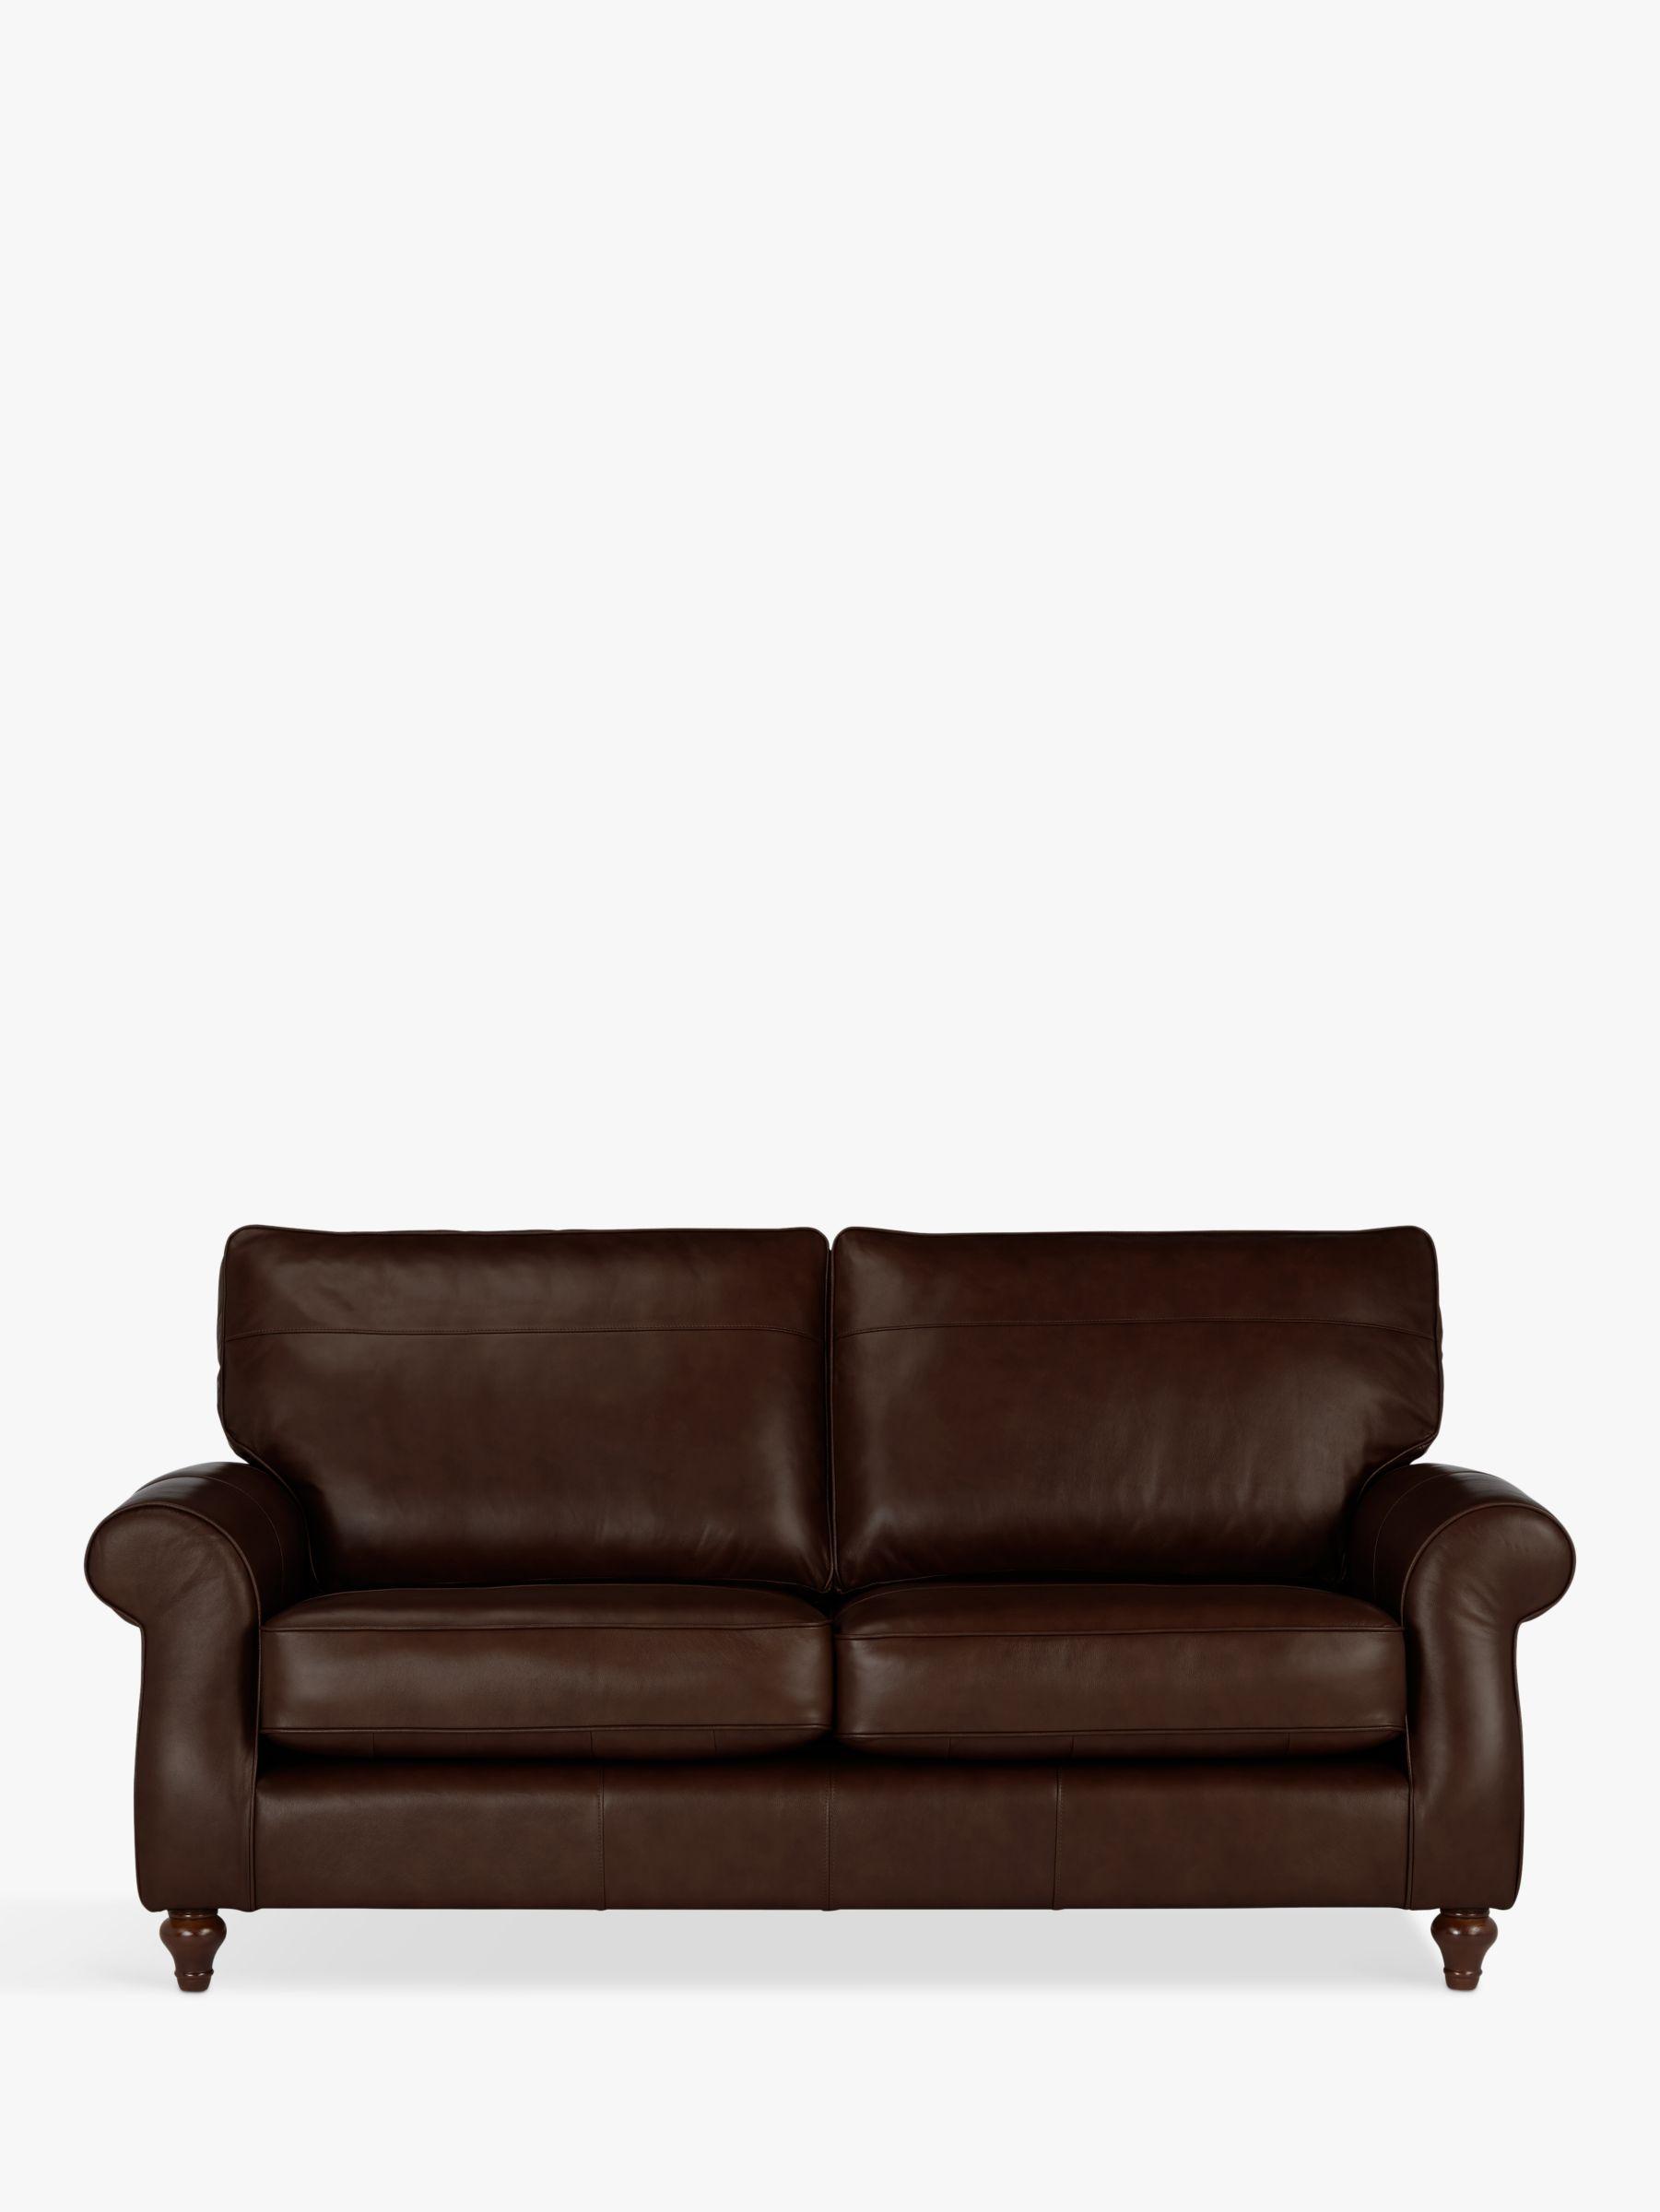 king size sofa bed ikea terracotta leather uk design amazing sleeper